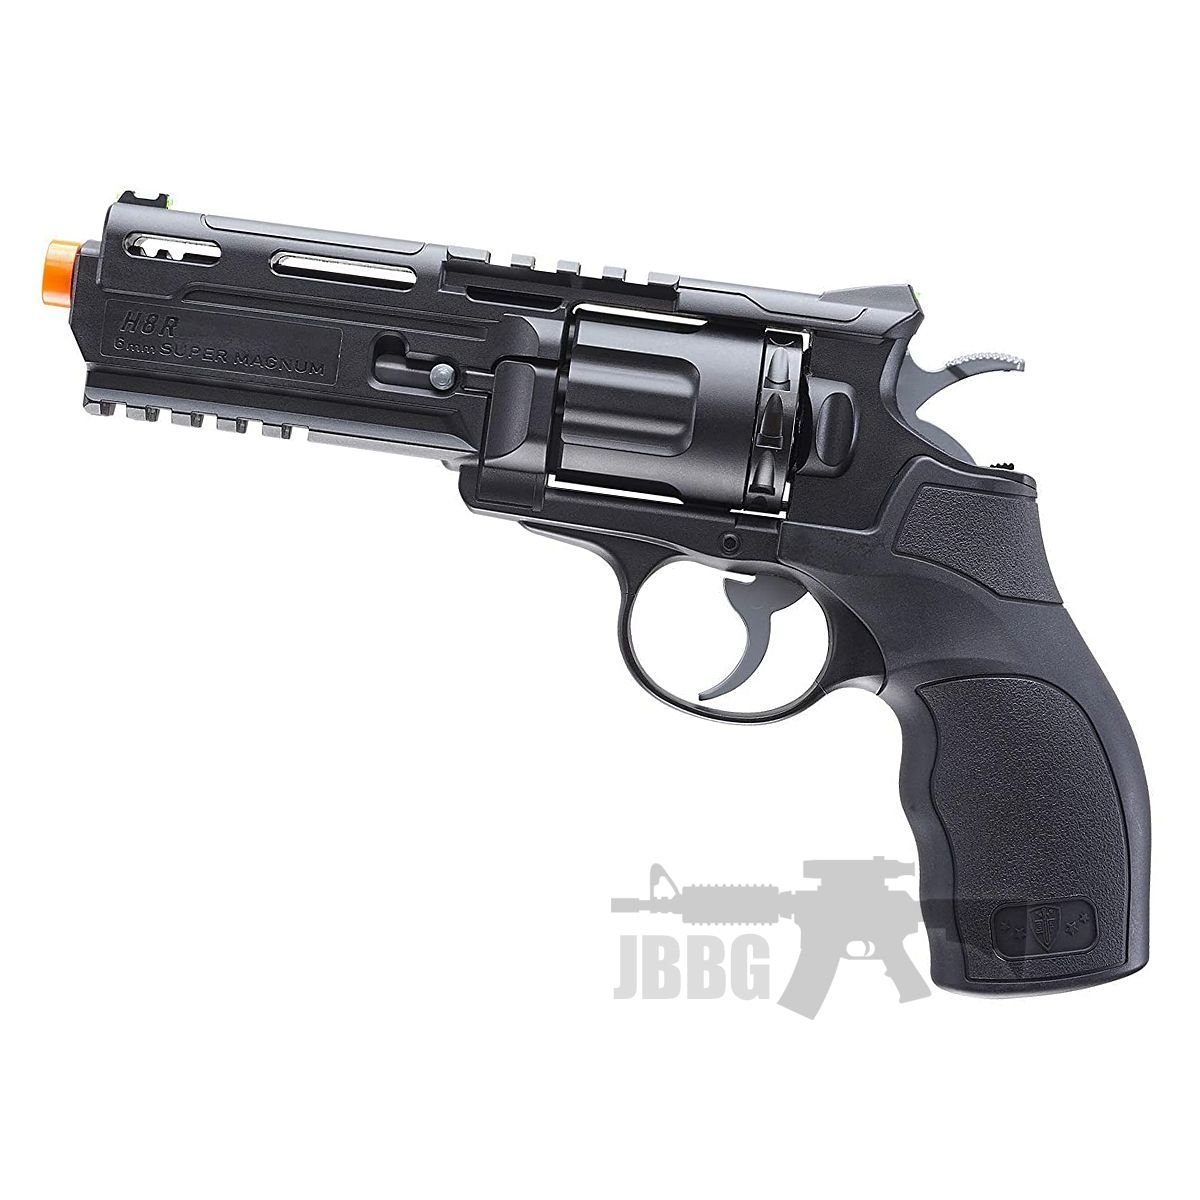 Glock G17 Gen5 Co2 Airsoft Pistol with Half Blowback (Copy)